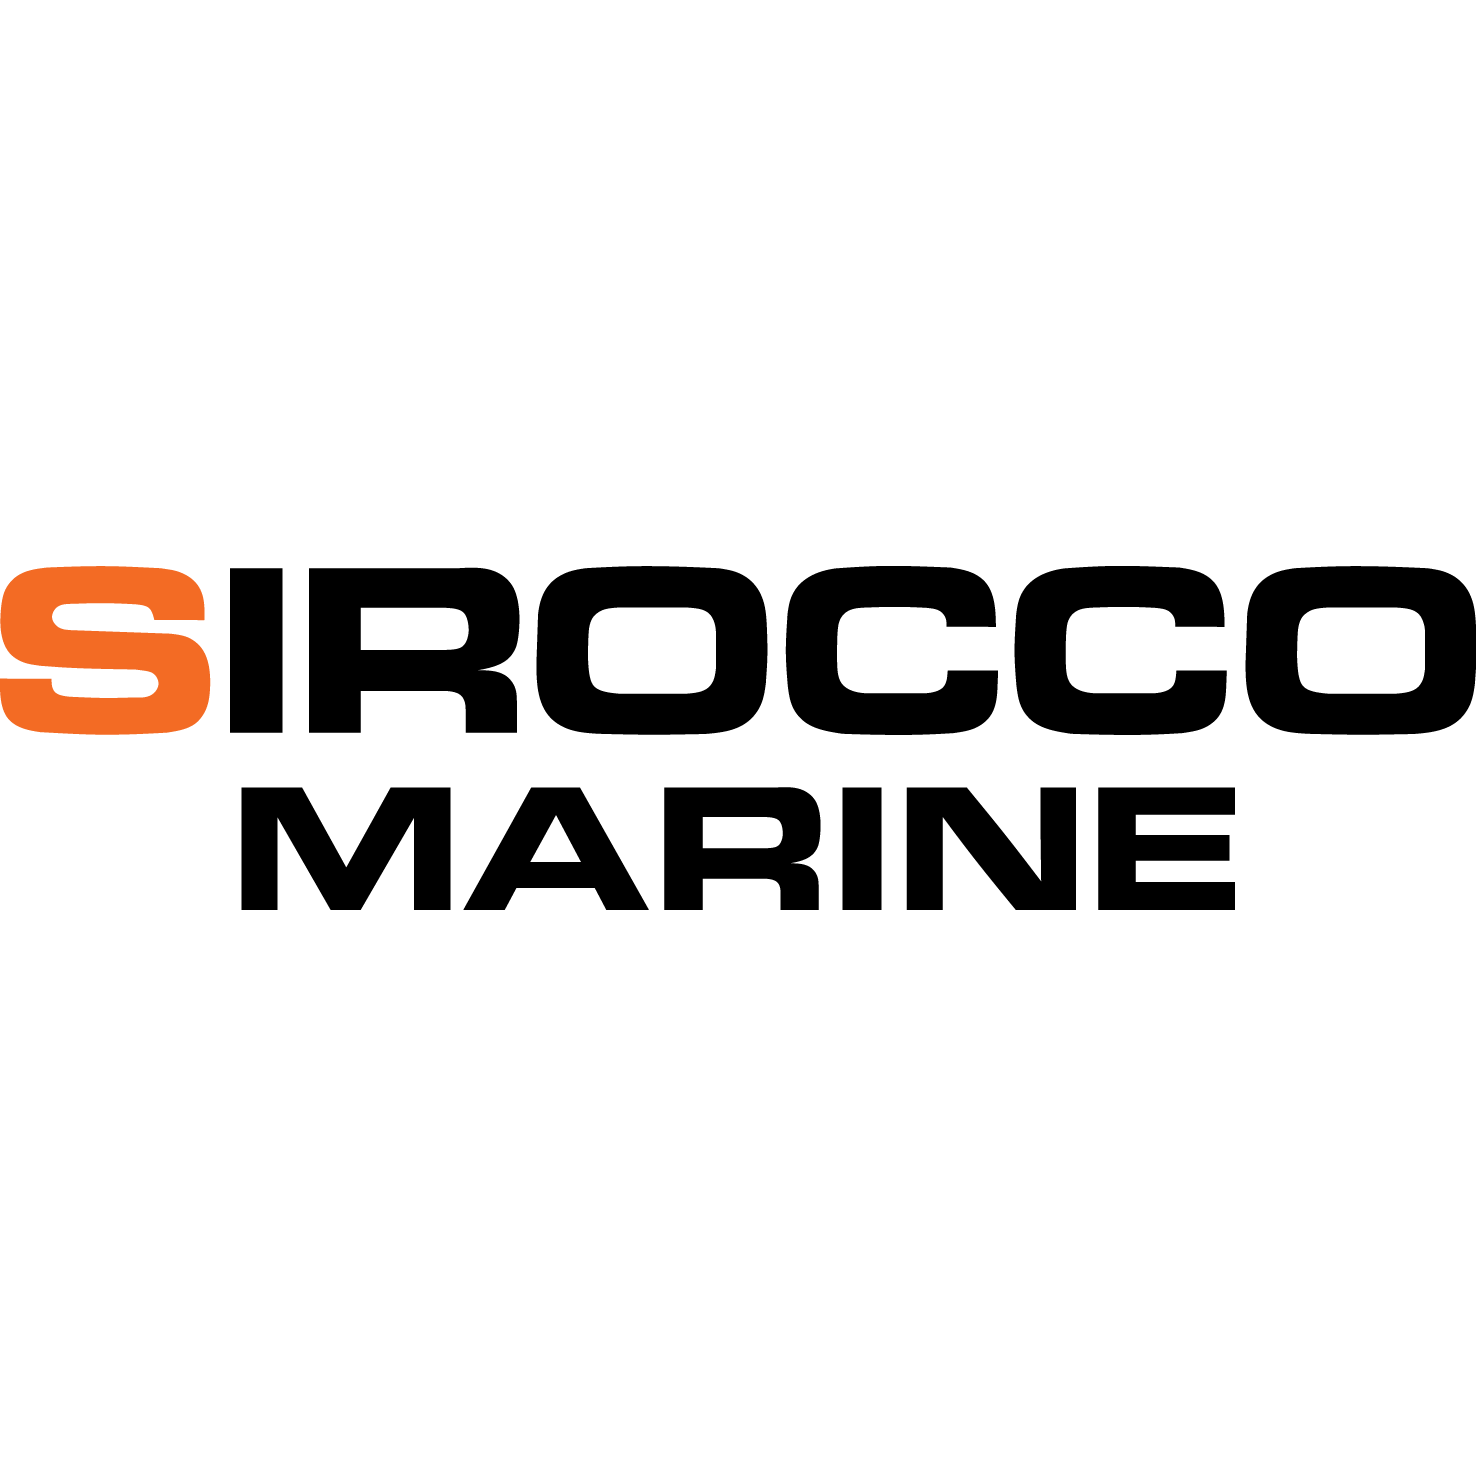 Sirocco Marine Annapolis